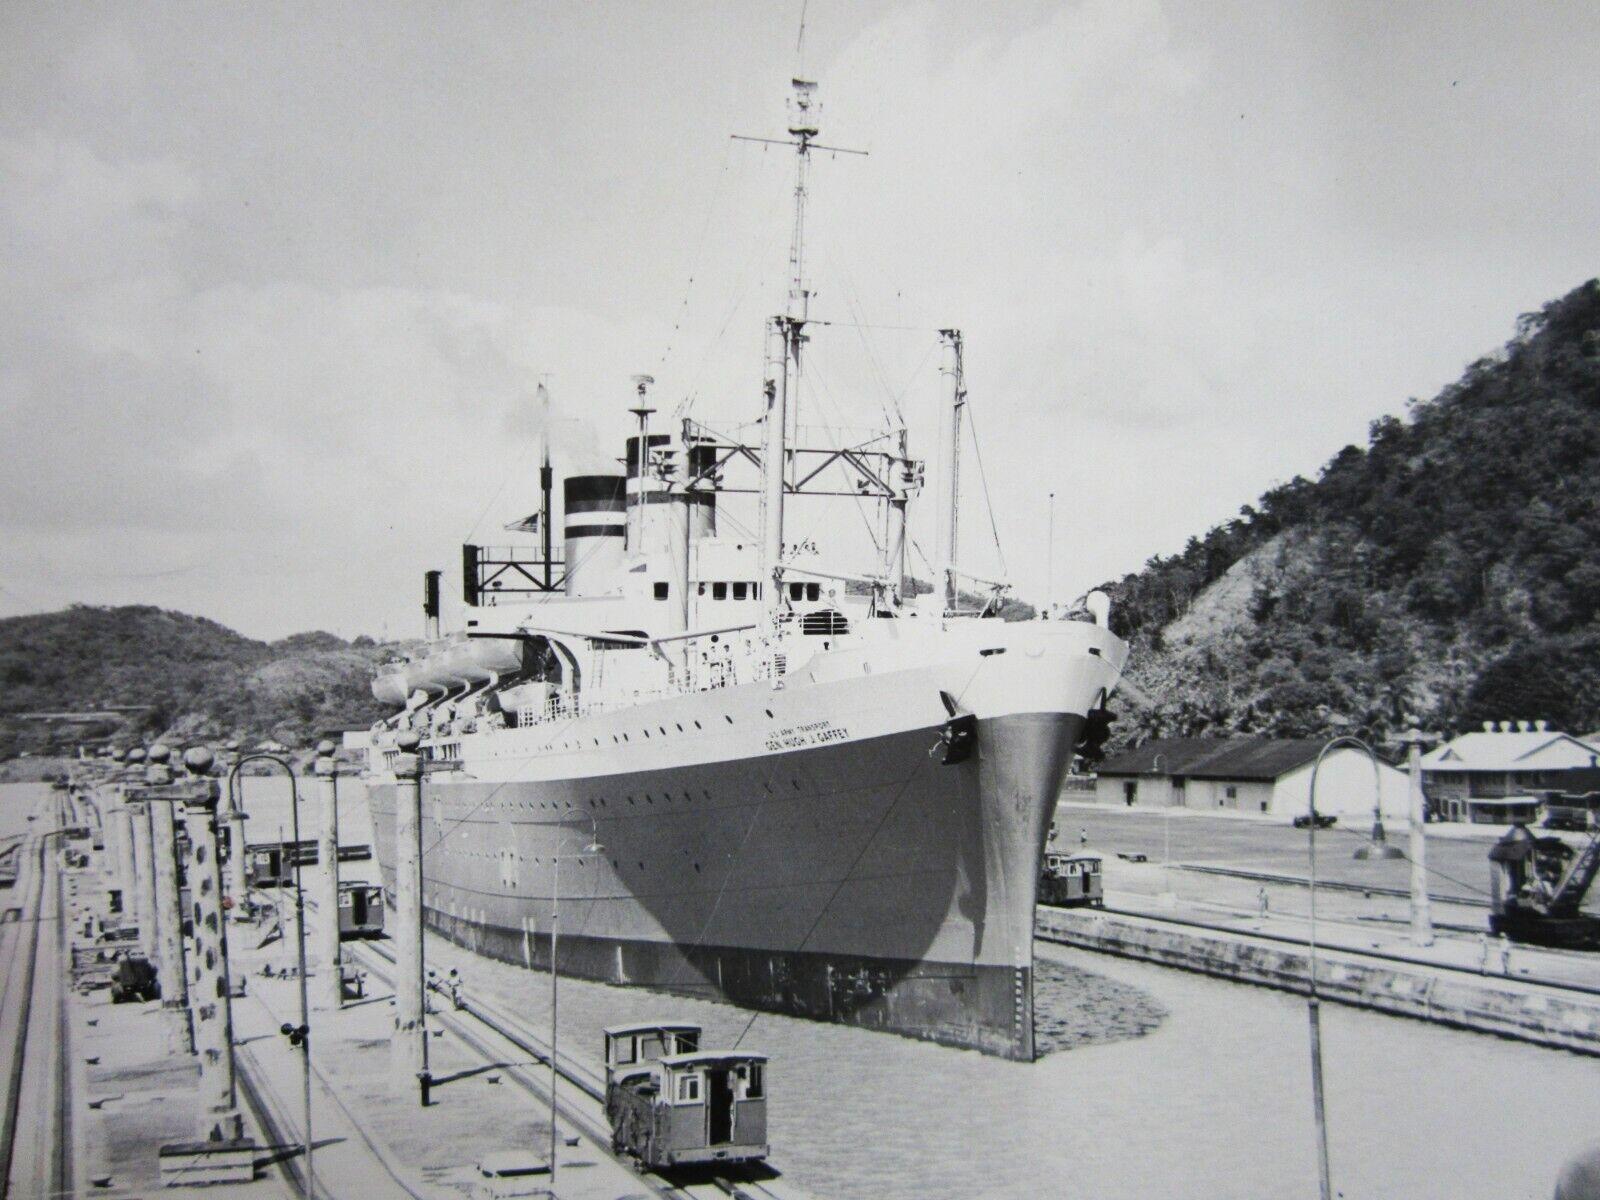 USAT General Hugh J. Gaffey Photo Panama Canal Pedro Miguel Locks 1946-50